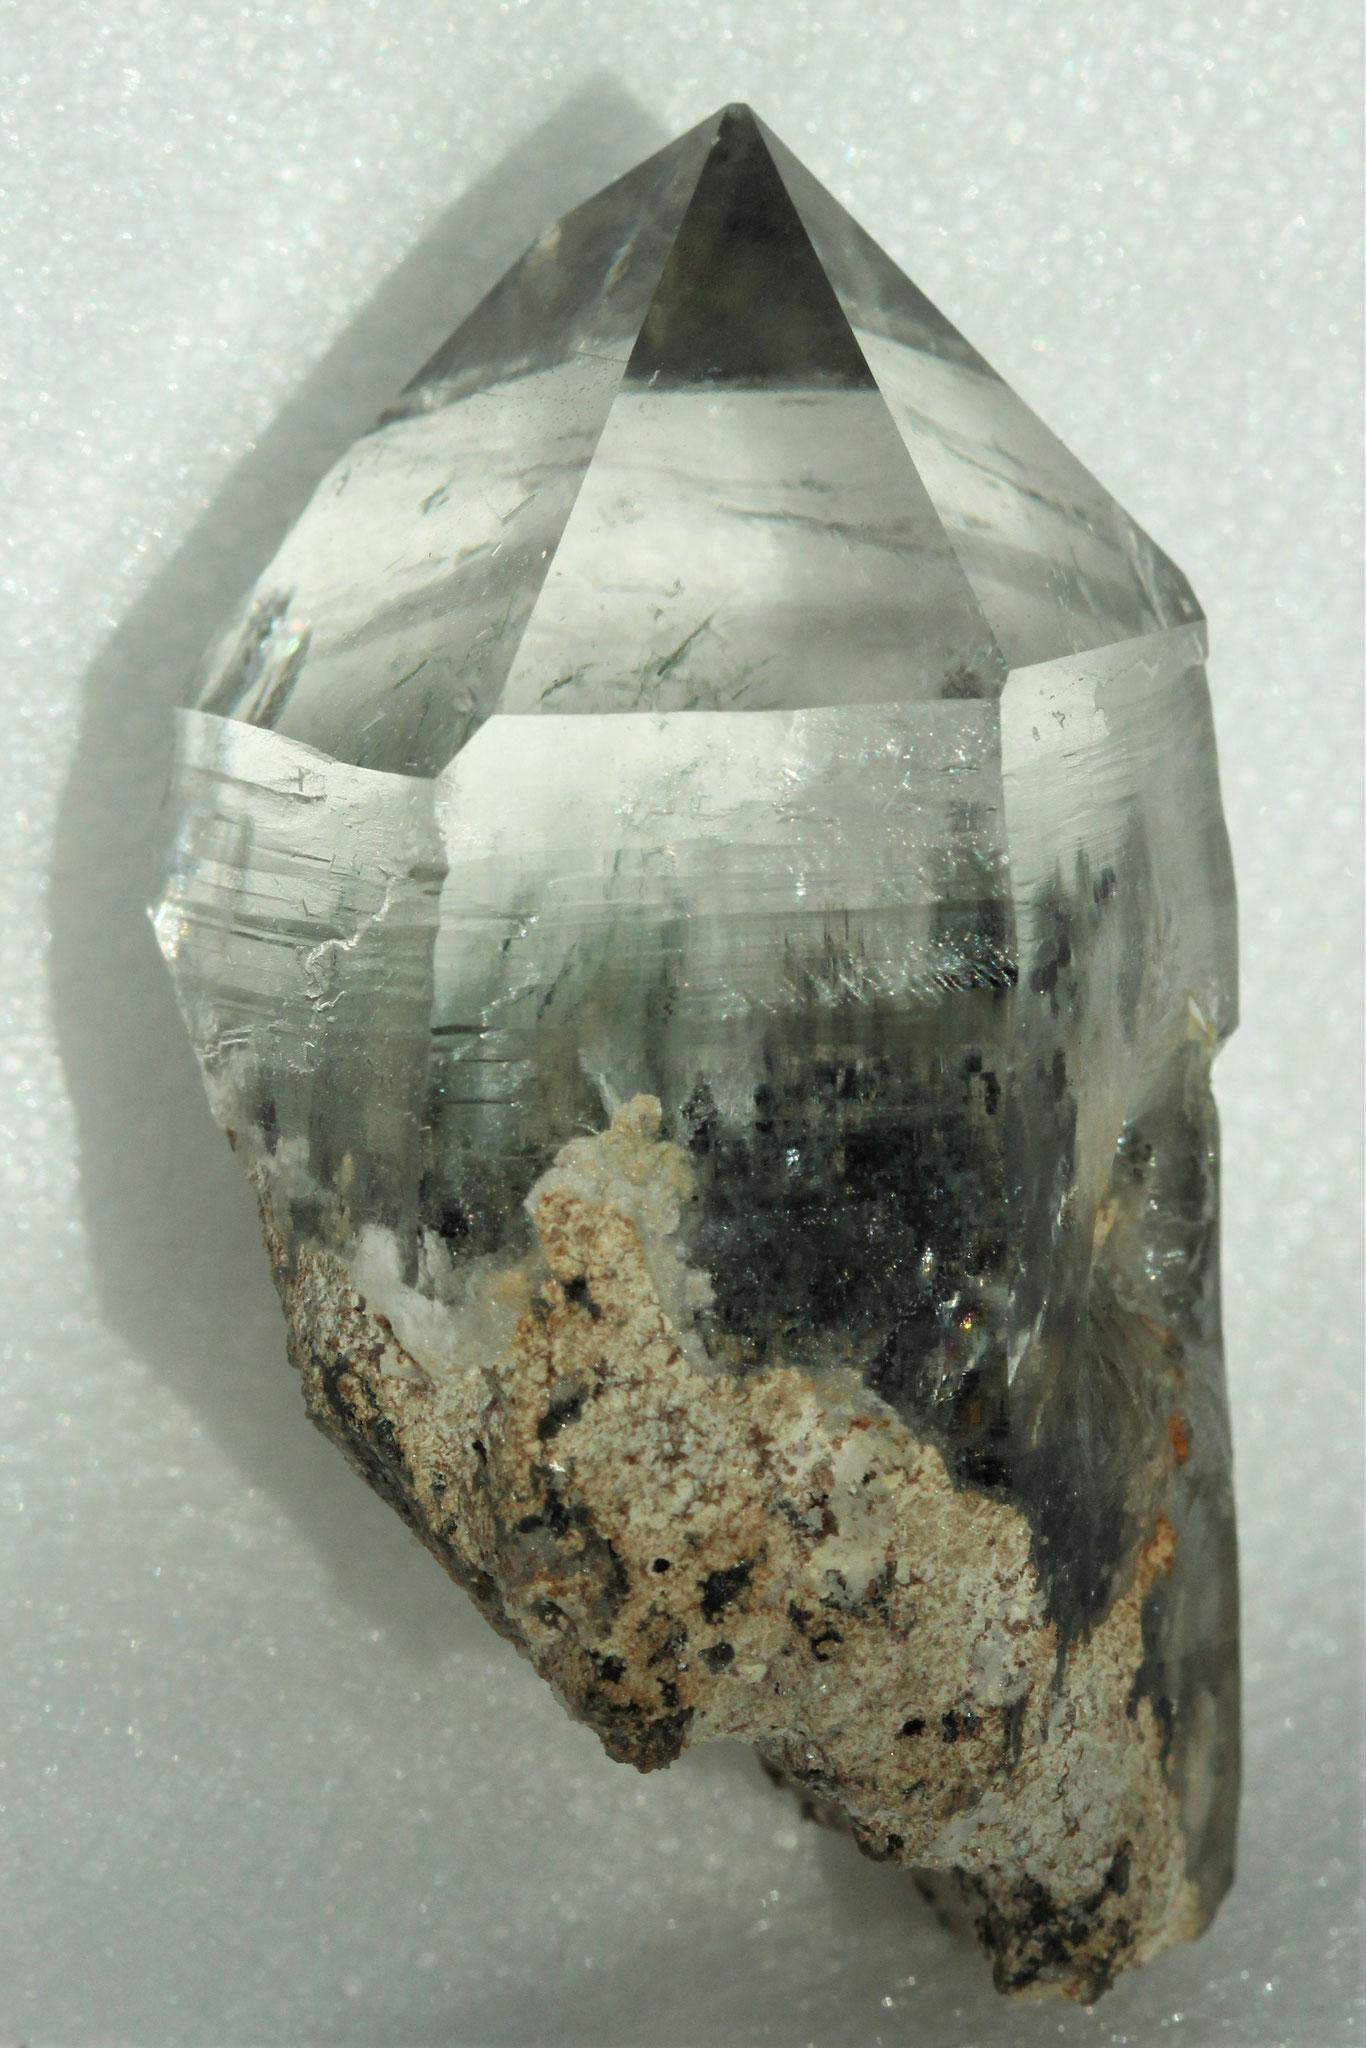 Bergkristall mit Aktinolit - Tremola (TI)